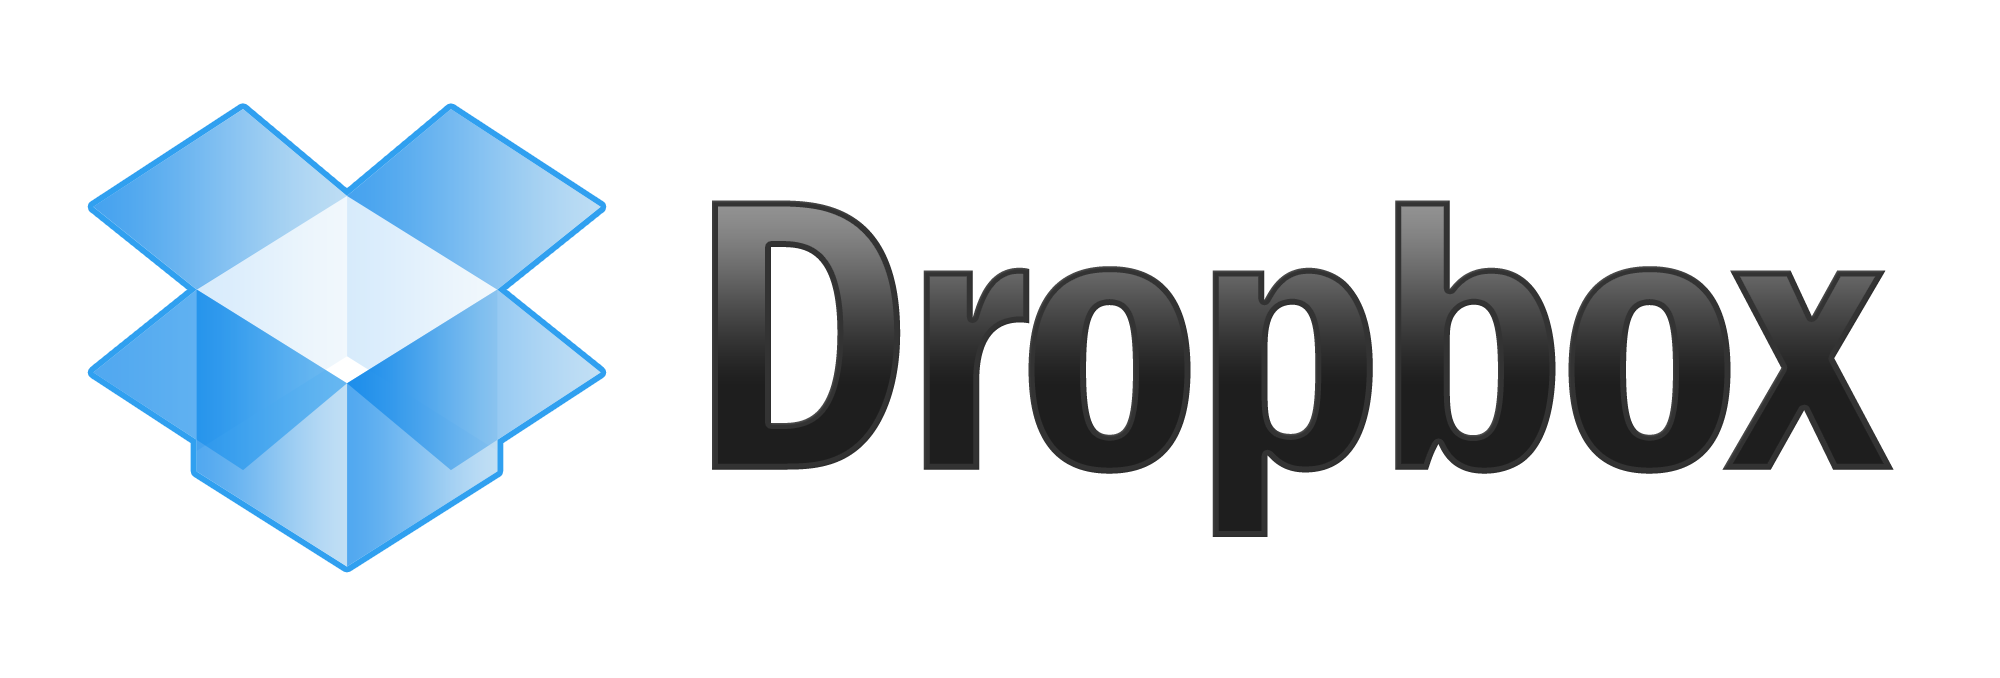 dropbox-logo-large